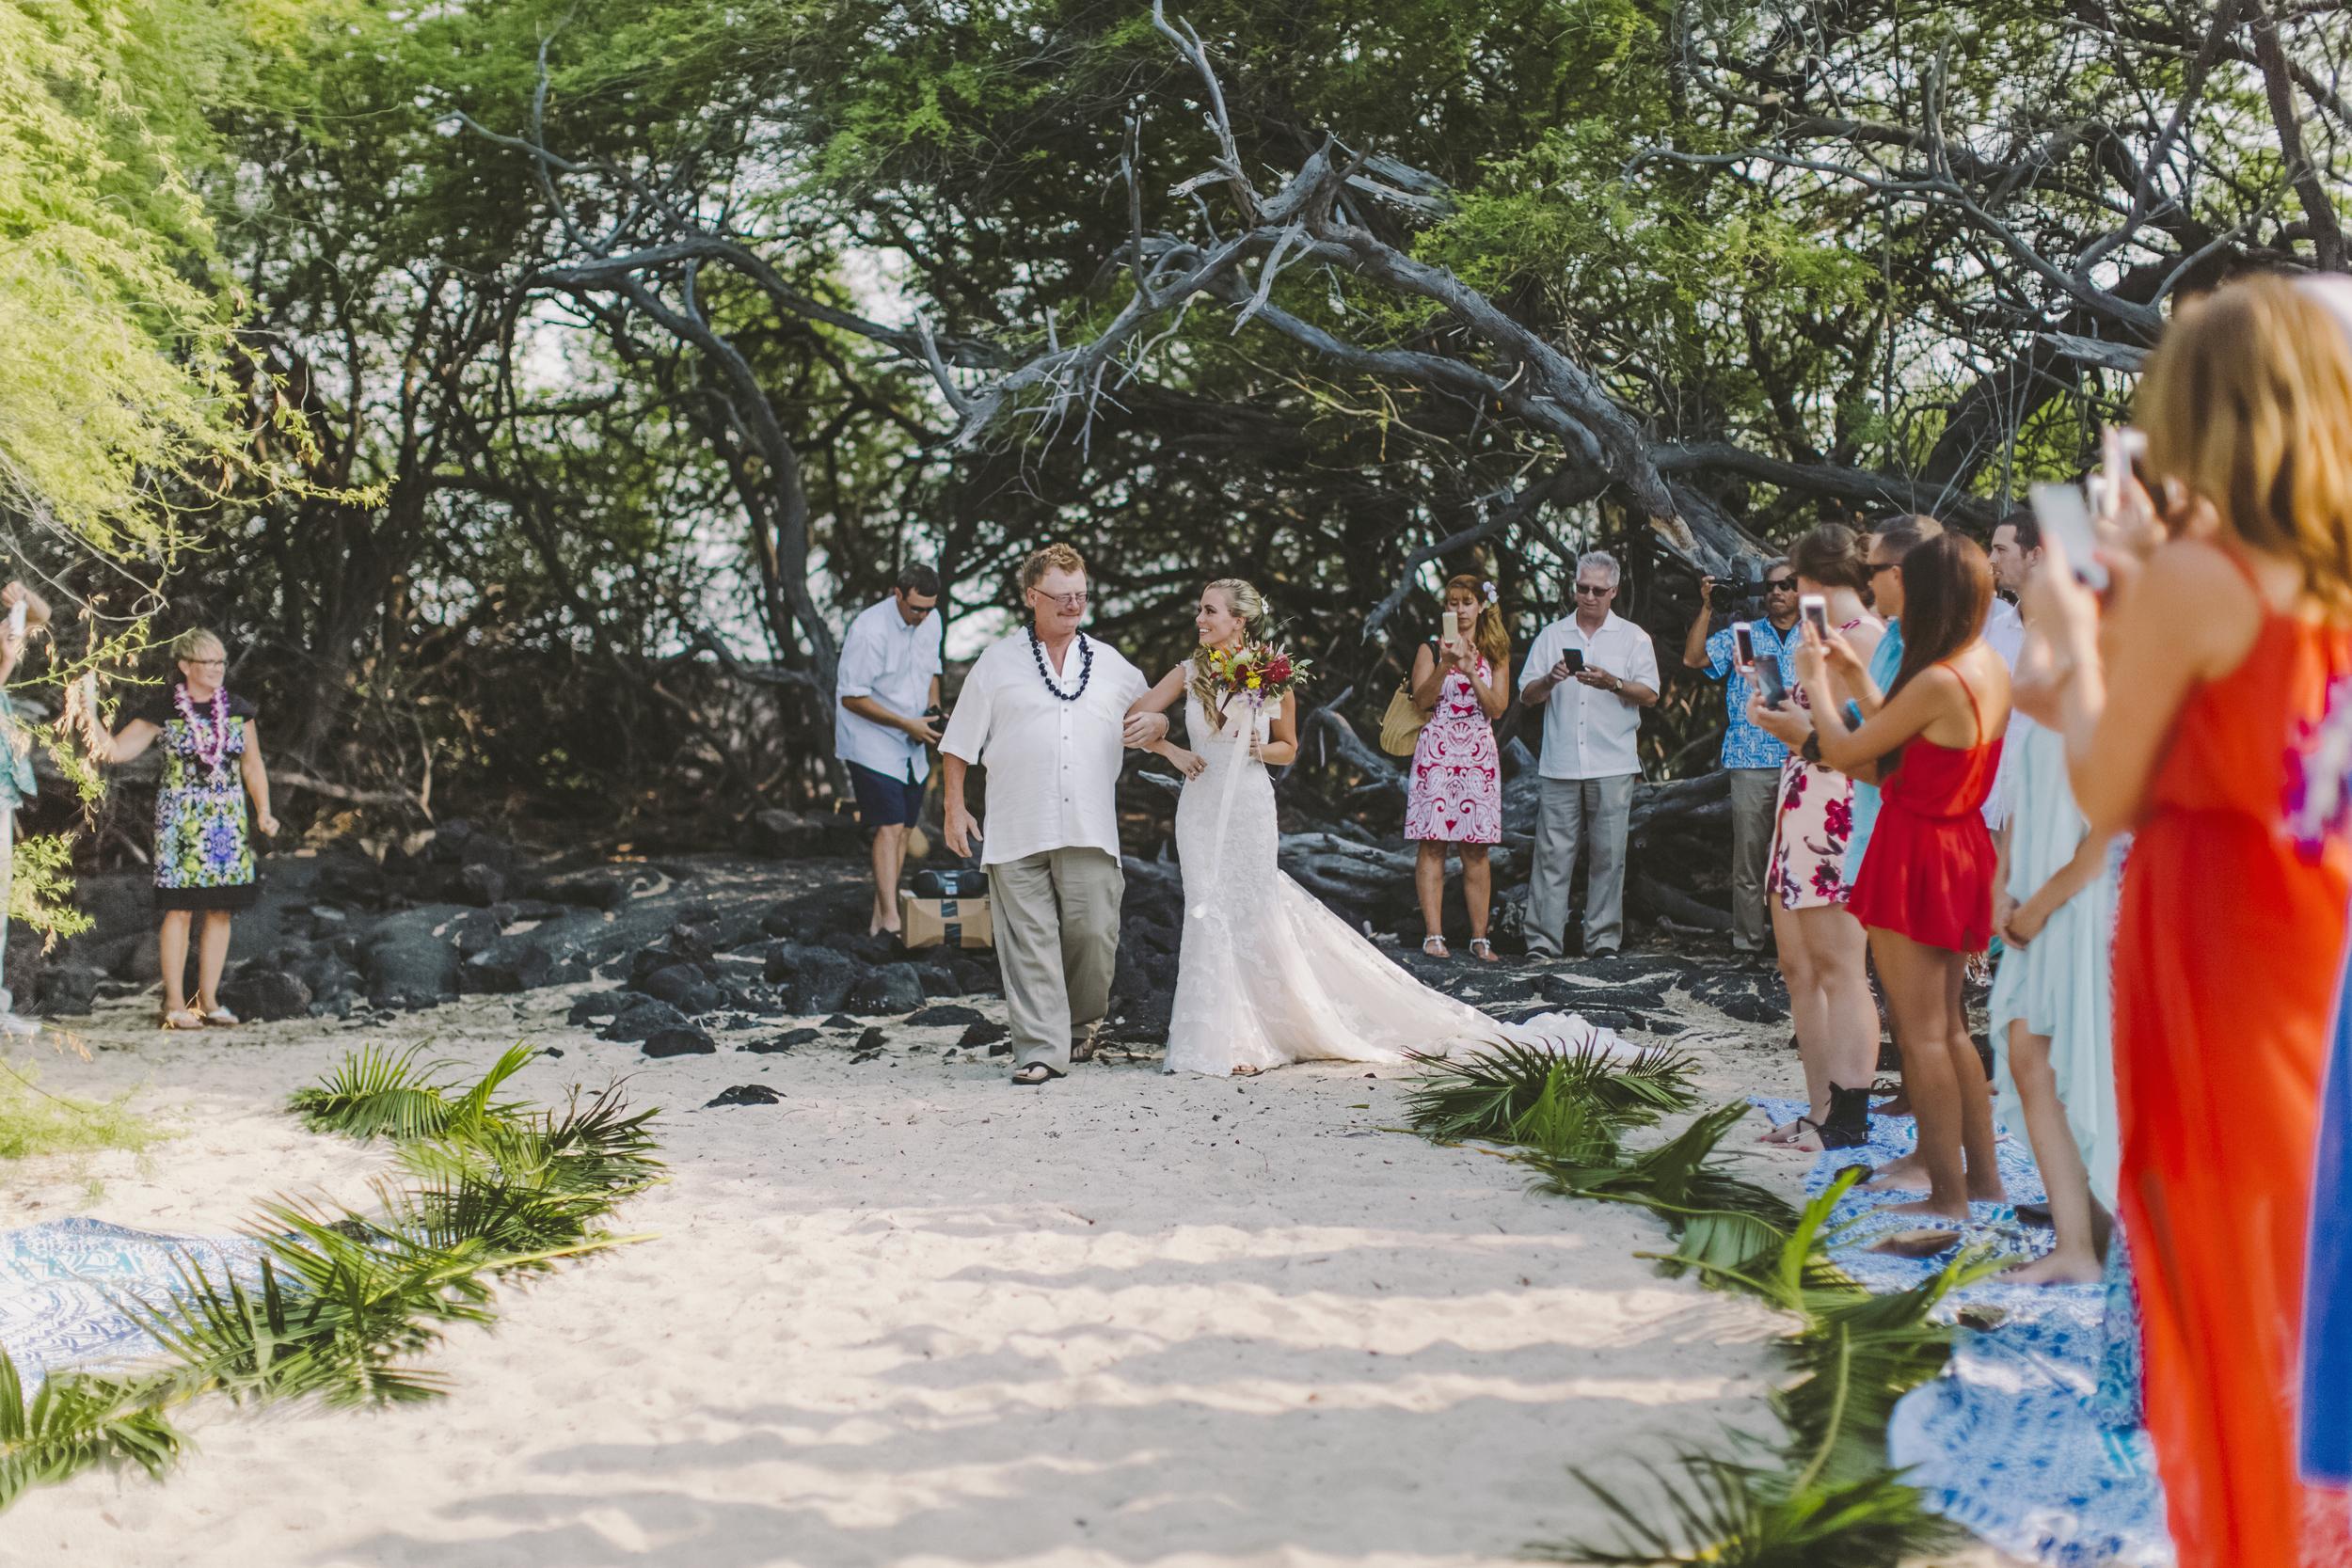 angie-diaz-photography-hawaii-wedding-photographer-kelli-jay-54.jpg